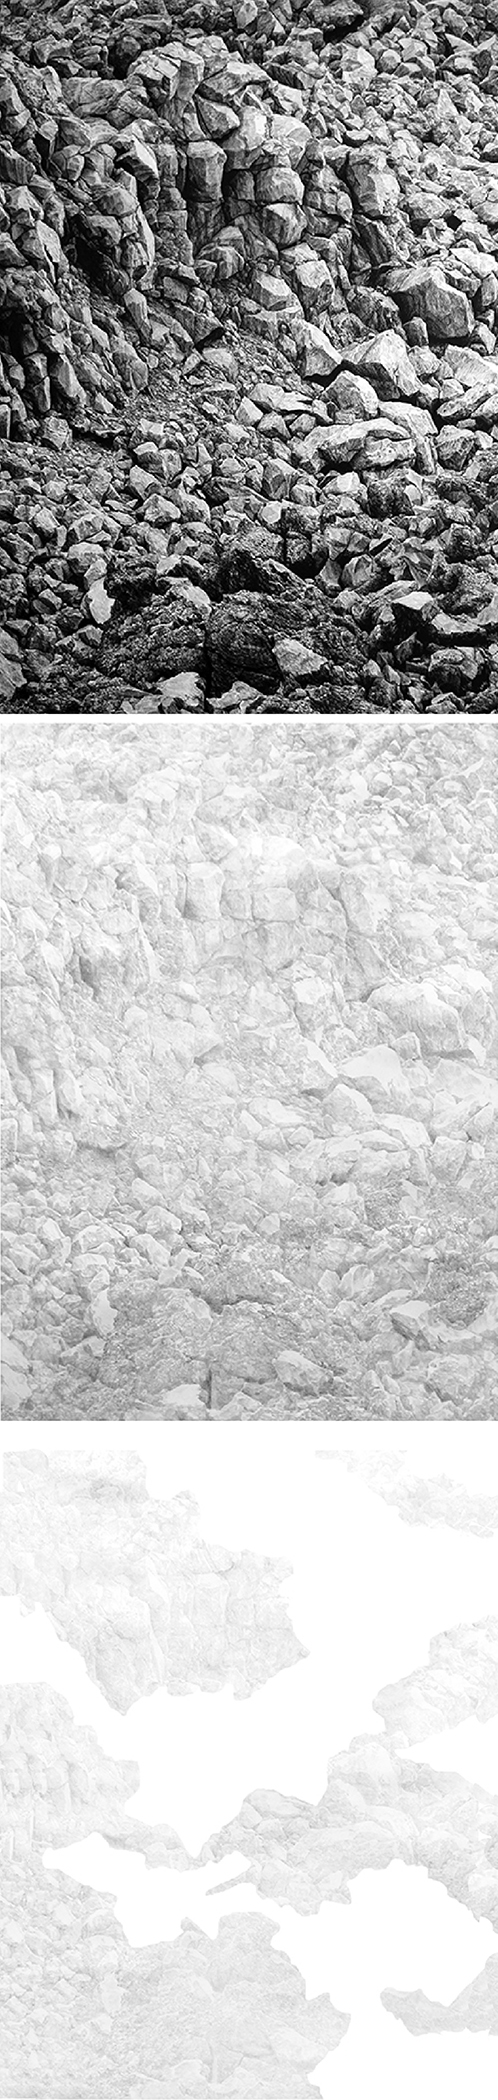 Under the Volcano I    ,    2012    Lápiz de color,papel / Coloured pencil,paper    200 x 150 cm        Under the Volcano II    ,    2012    Lápiz de color,papel / Coloured pencil,paper    200 x 150 cm        Under the Volcano III    ,    2012    Lápiz de color,papel / Coloured pencil,paper    200 x 150 cm